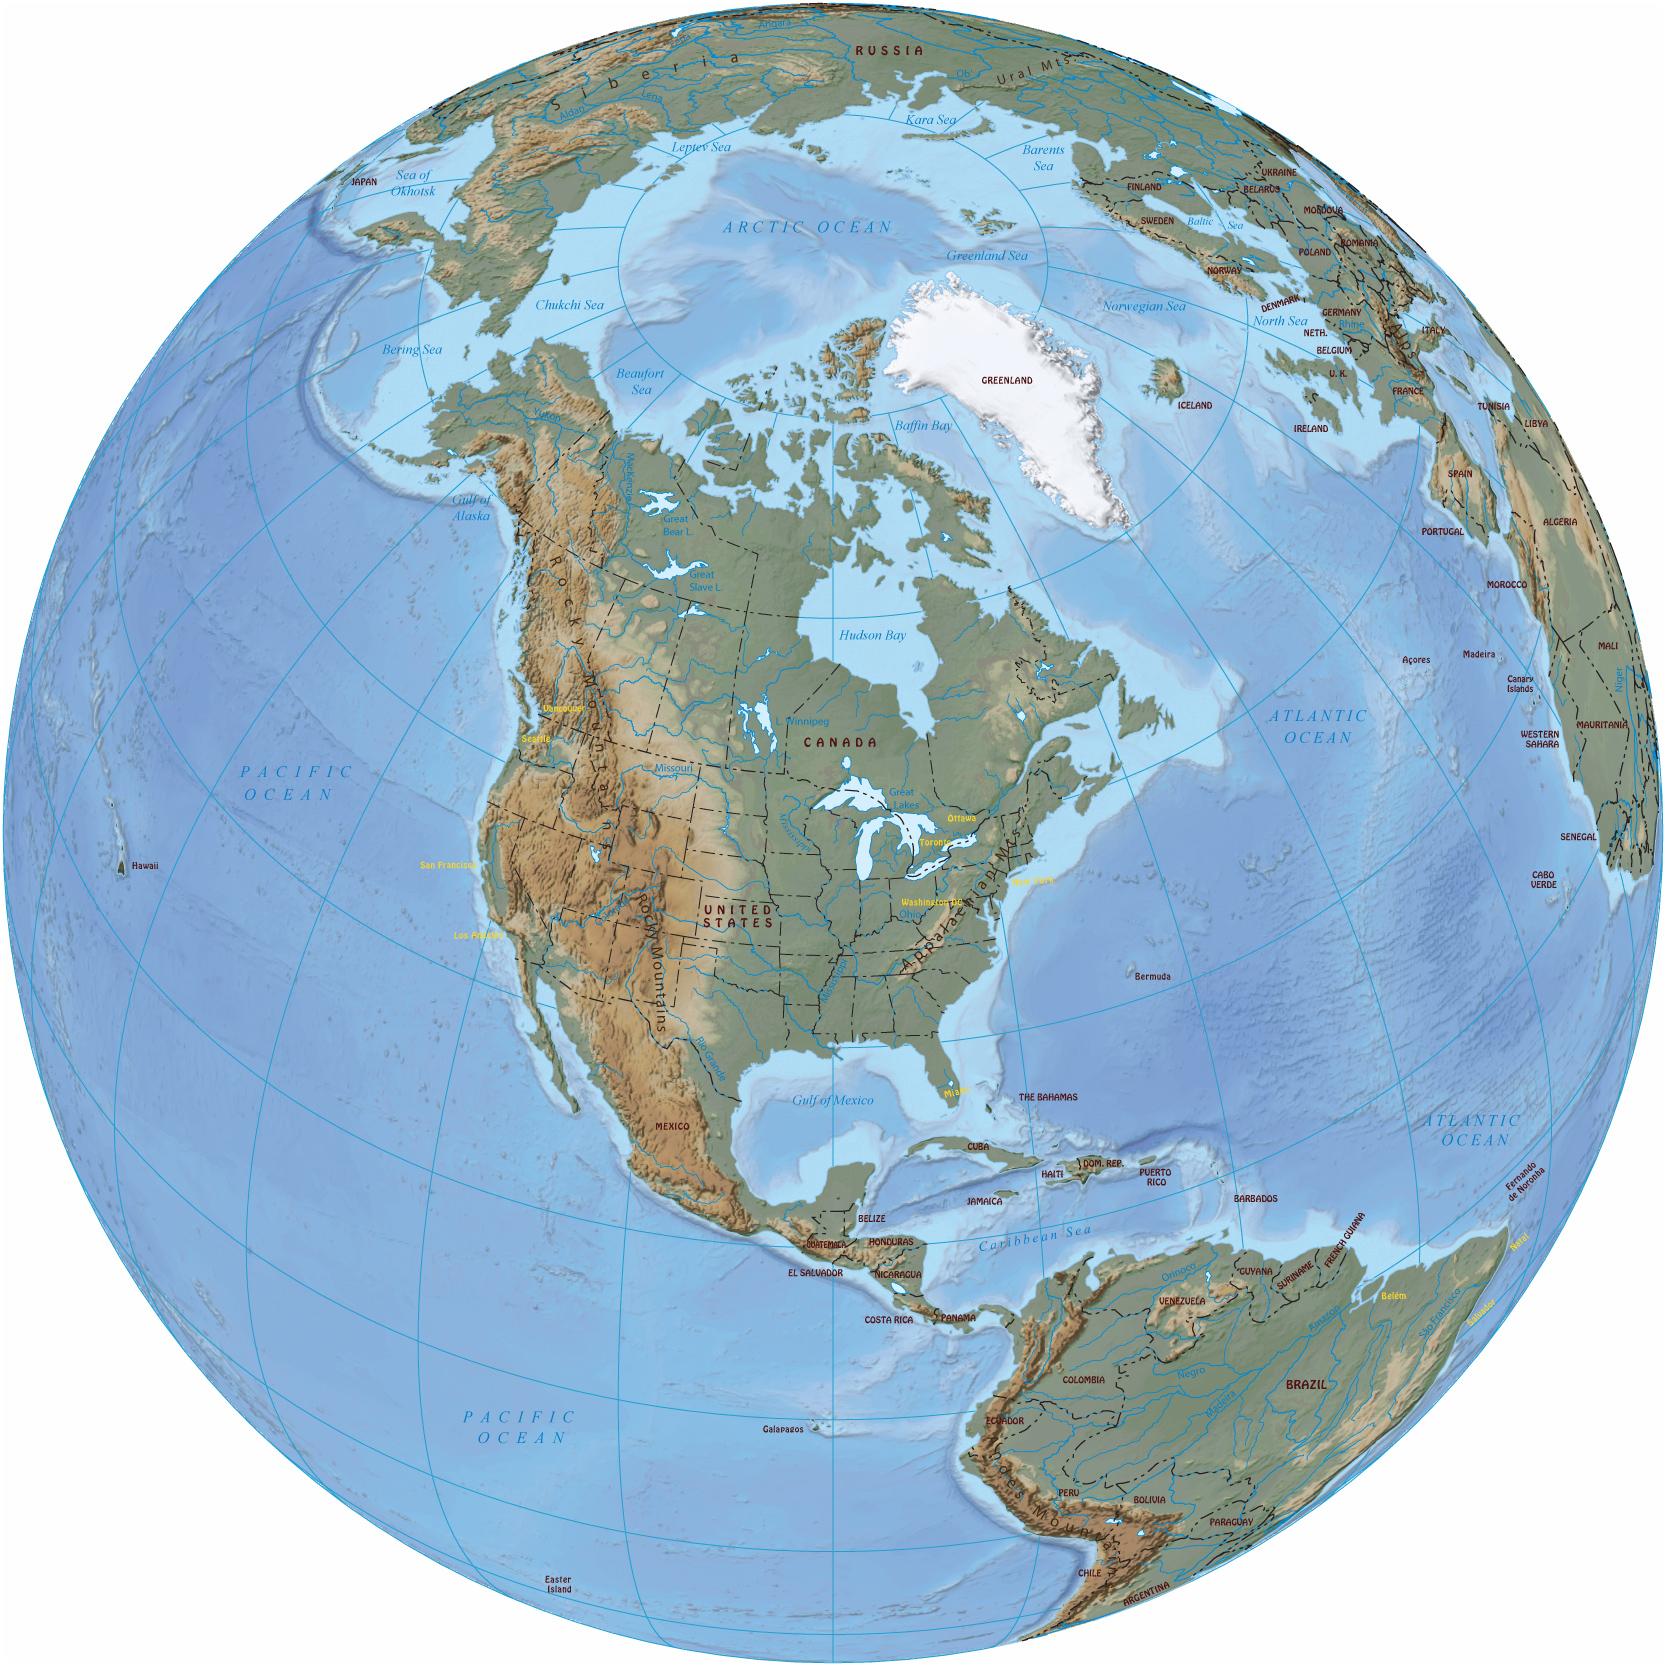 north america in the globe